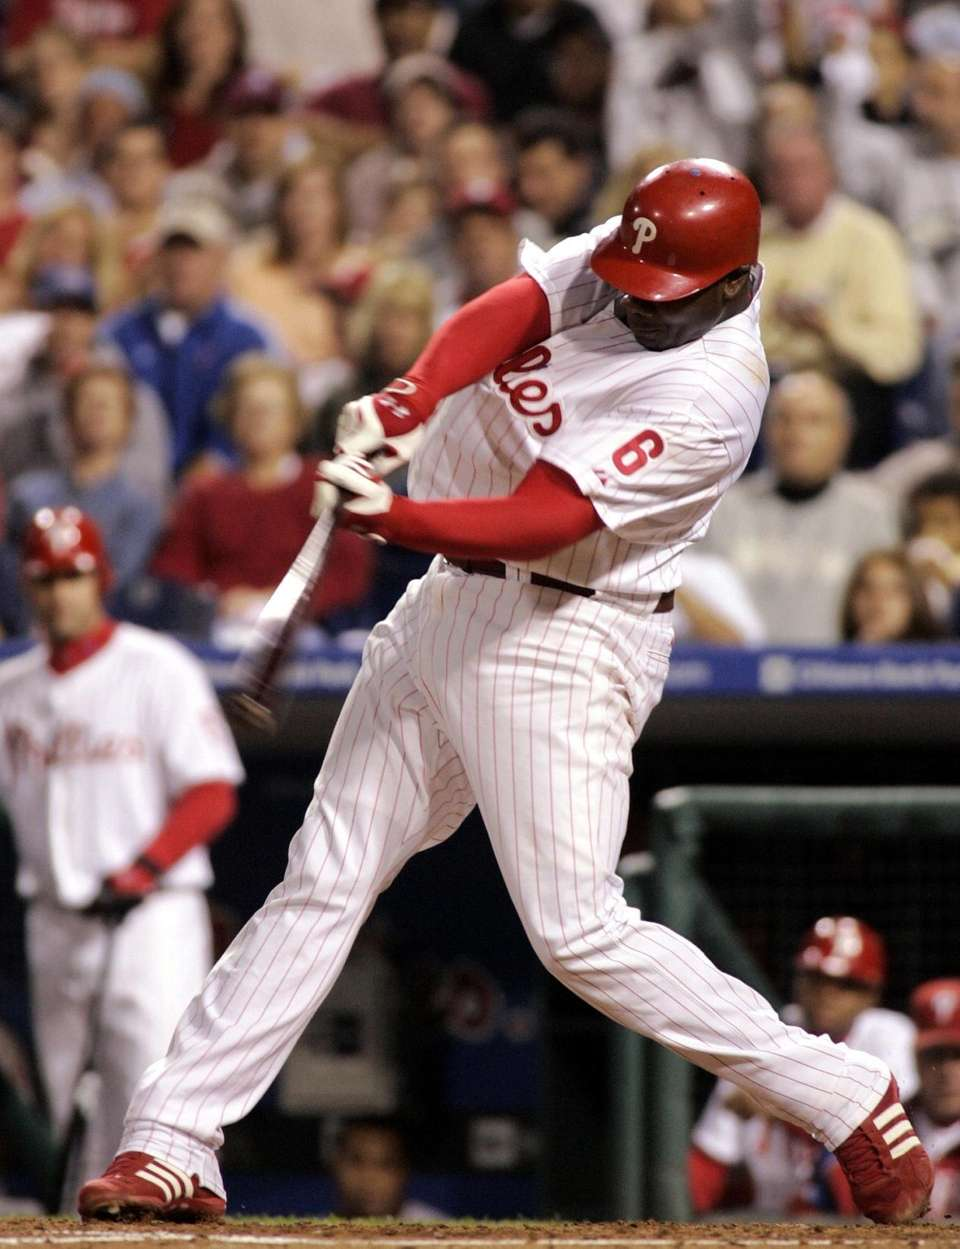 RYAN HOWARD 2006, Philadelphia Phillies 58 home runs